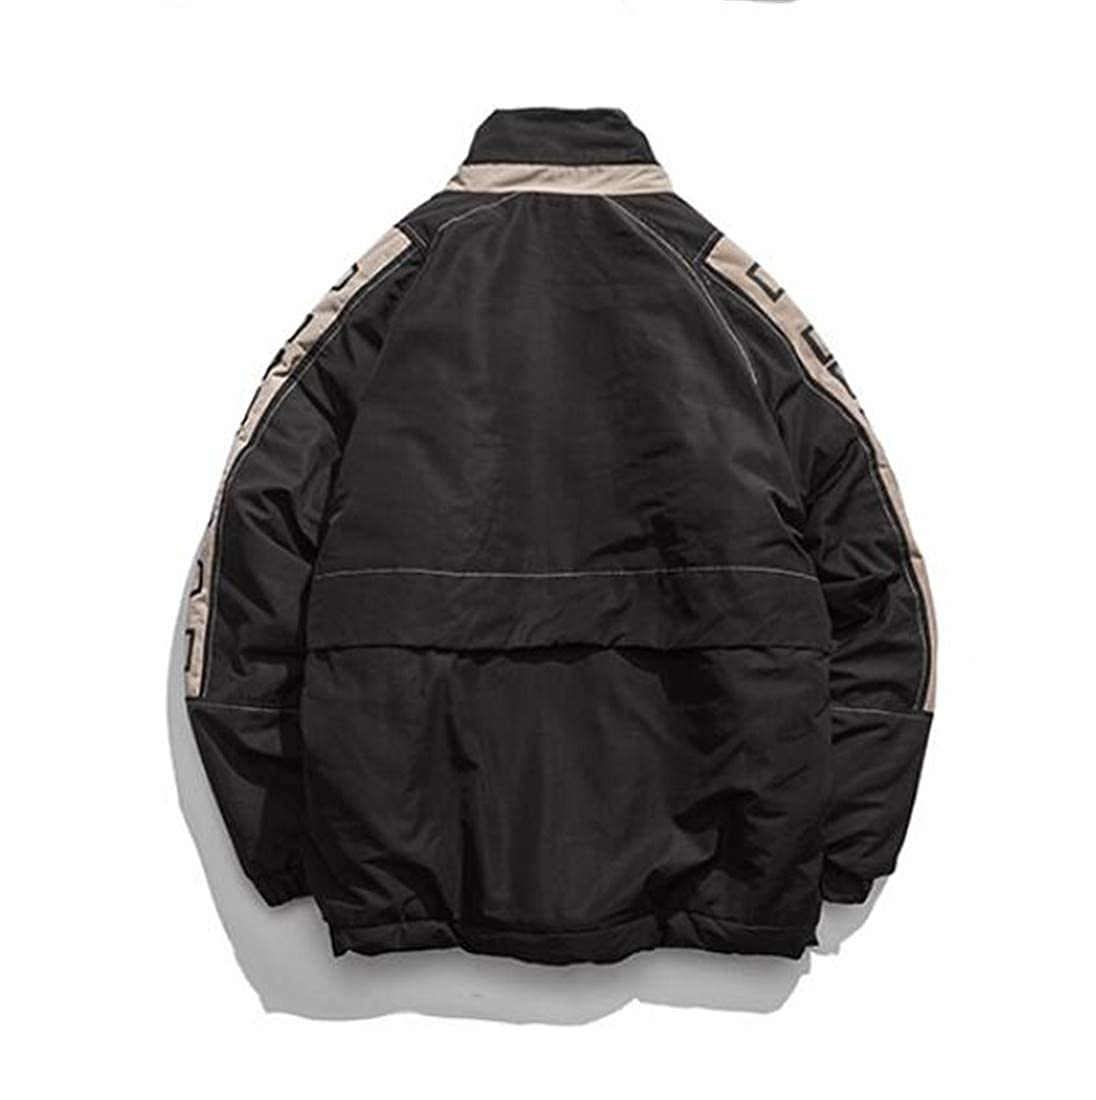 XiaoTianXinMen XTX Men Cotton-Padded Winter Printed Hip-Hop Jacket Loose Parkas Coat